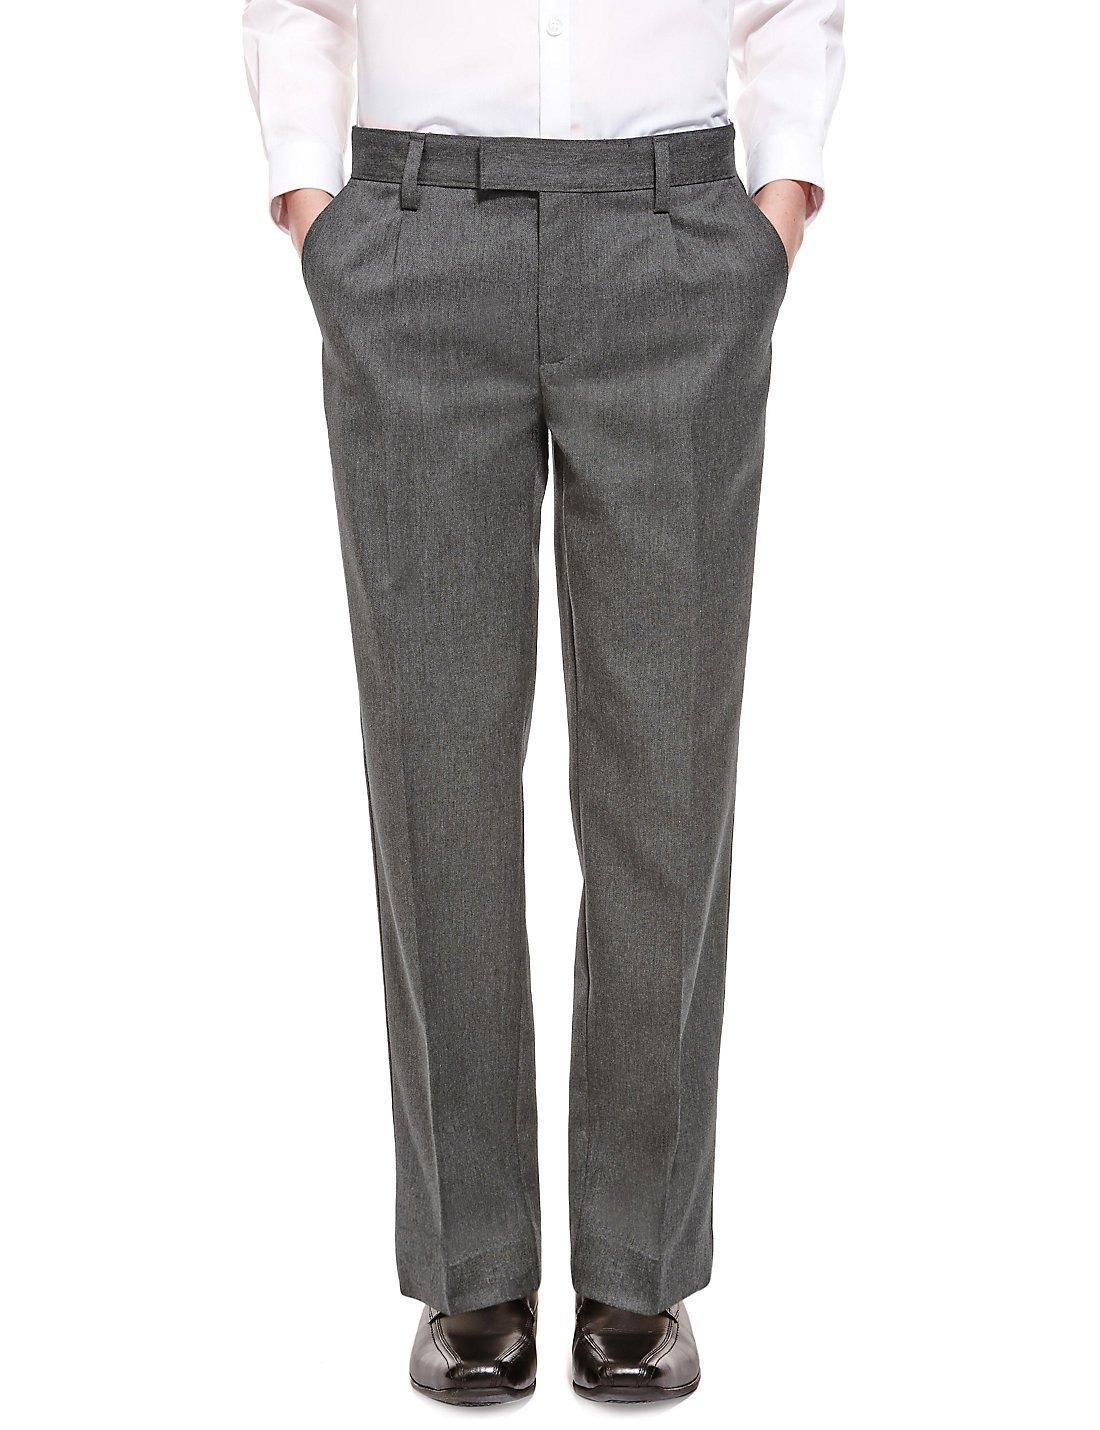 EX M/&S Boys Regular Fit Black Grey Charcoal Navy School Trousers Elastic Adjustable Waist 2-16 Yrs